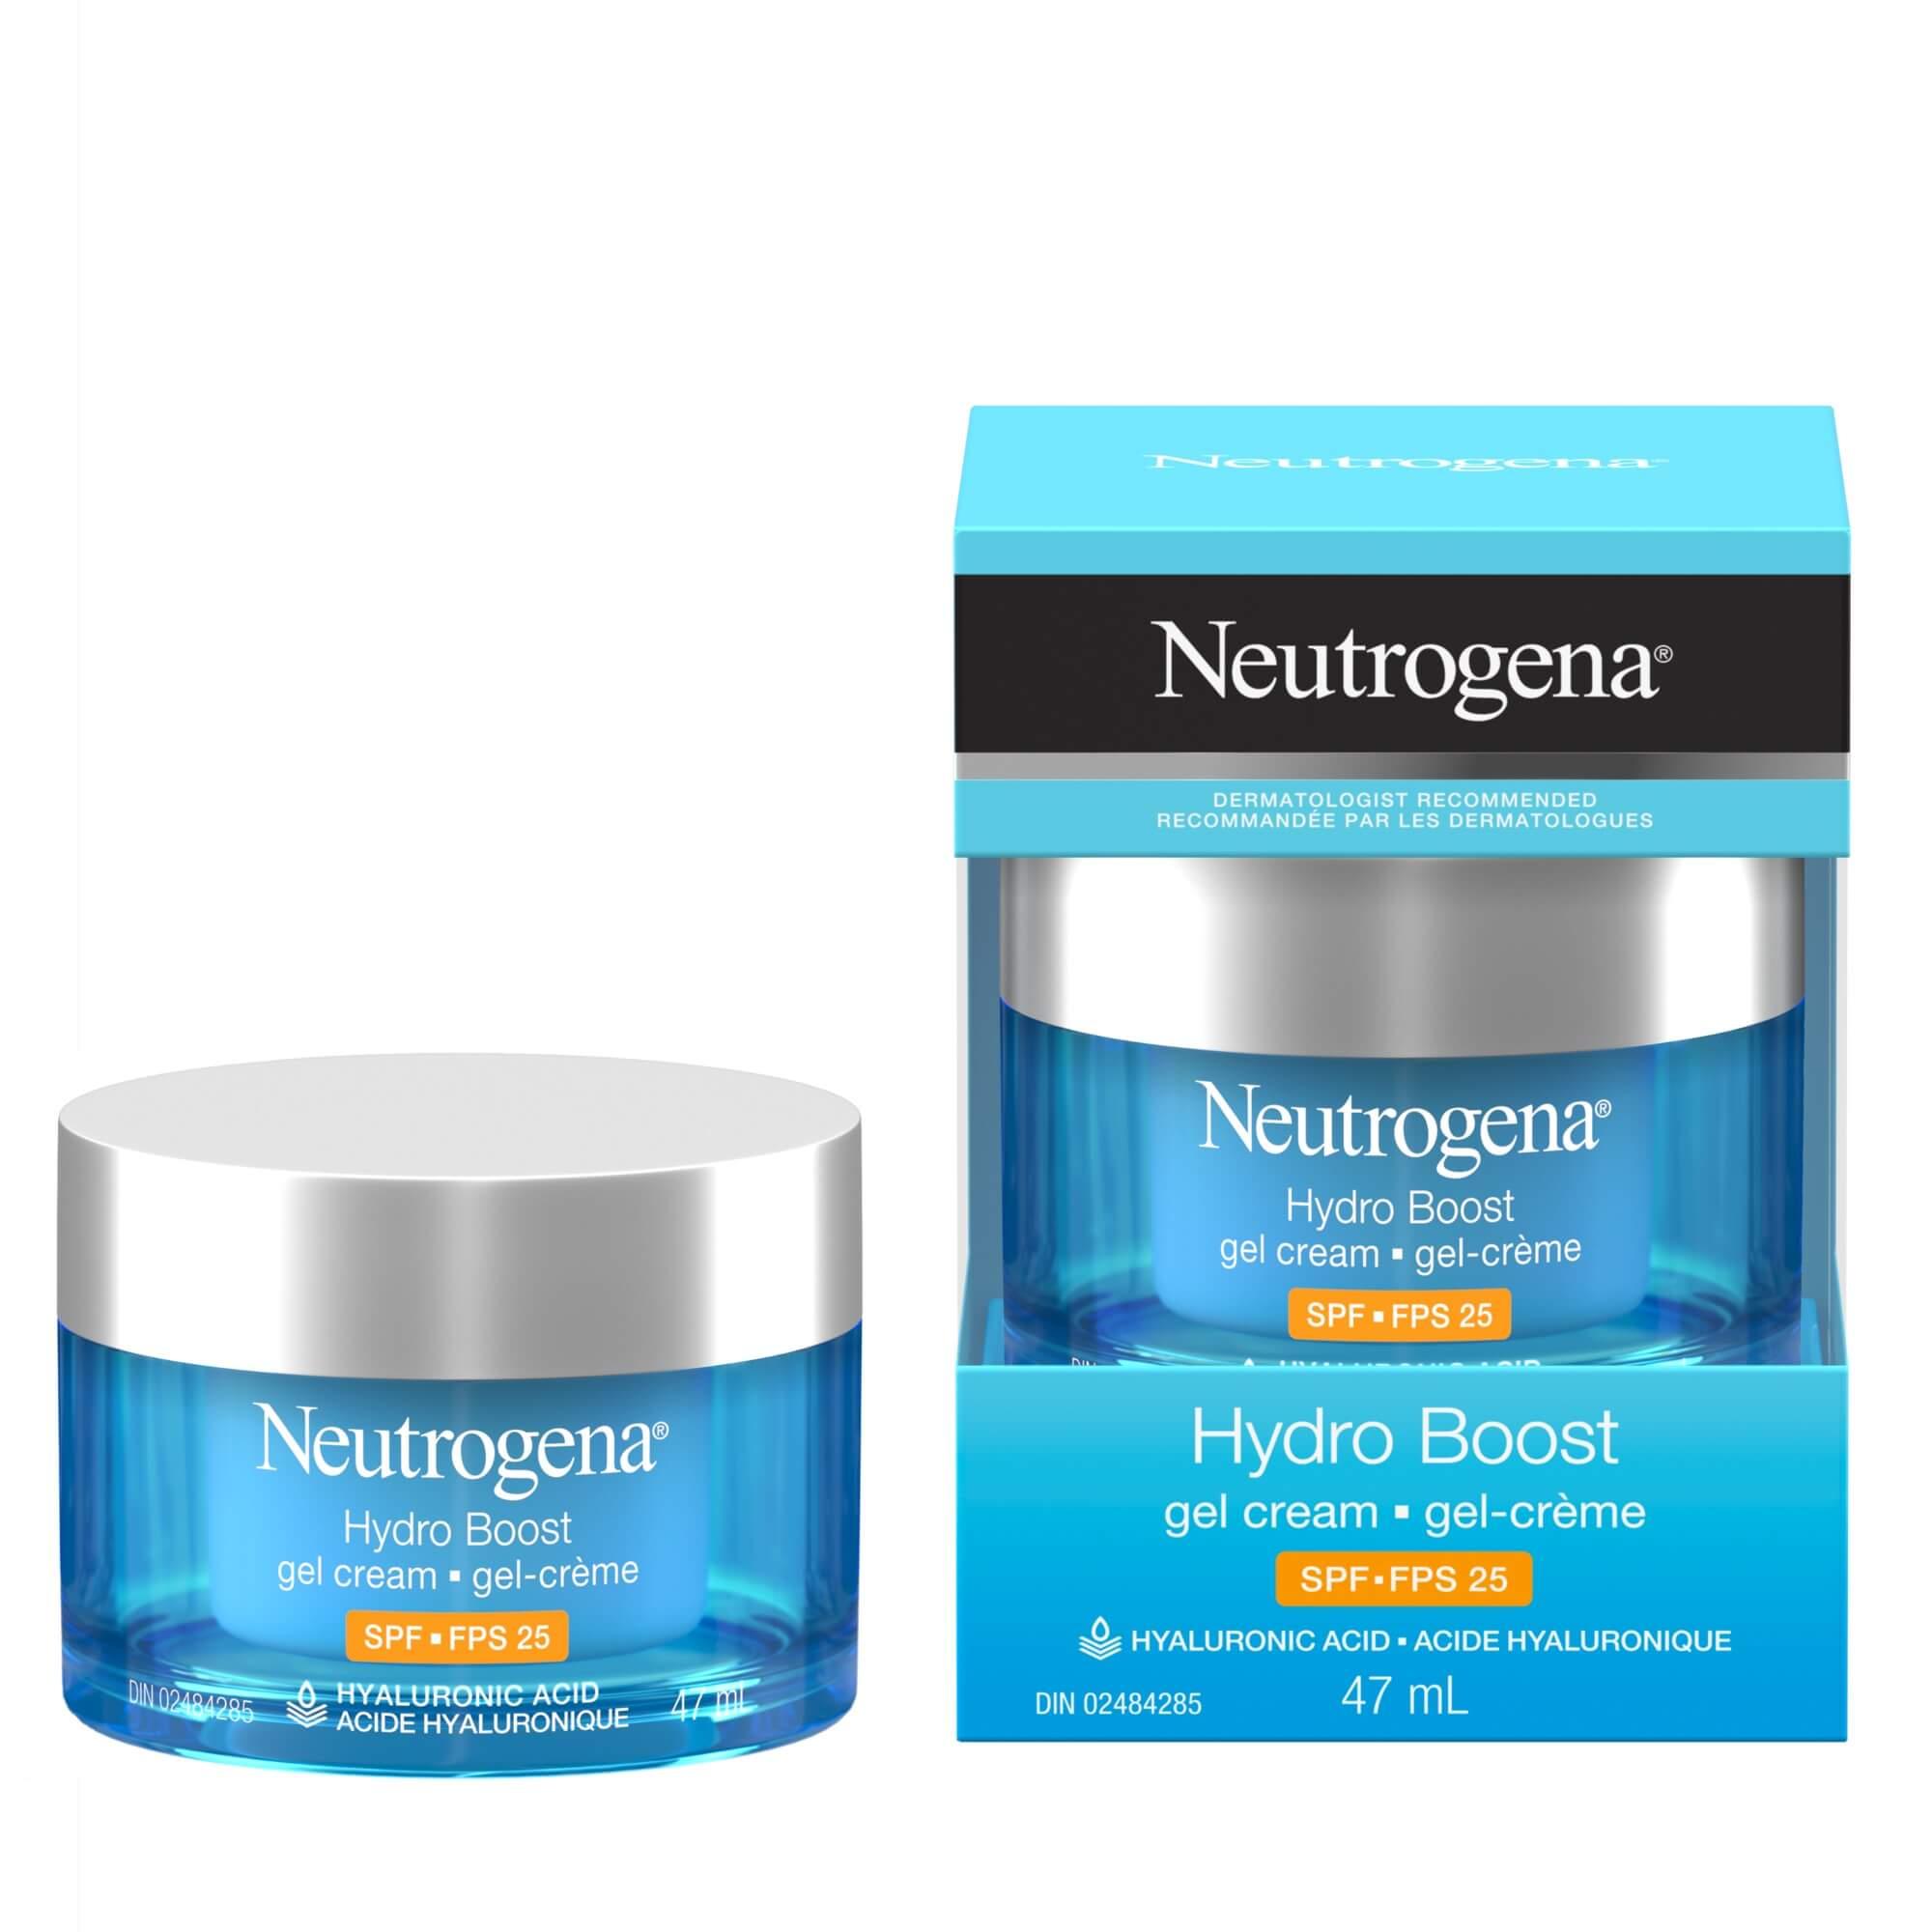 Gel-crème Neutrogena® Hydro Boost FPS 25, 47 ml